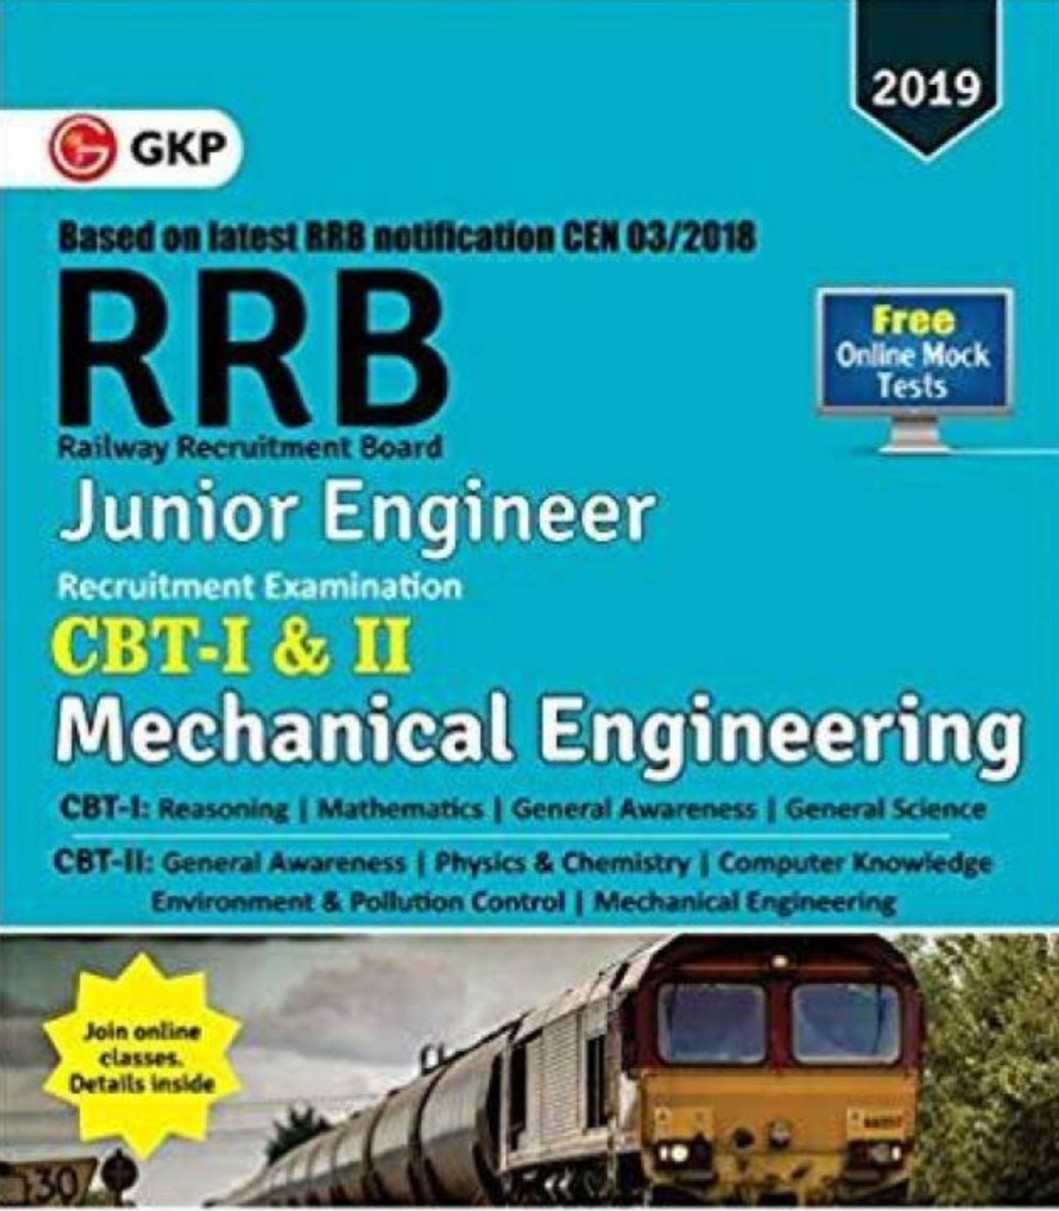 RRB – Railway Recruitment Board 2019 – Junior Engineering (CBT I & II)  MECHANICAL ENGINEERING